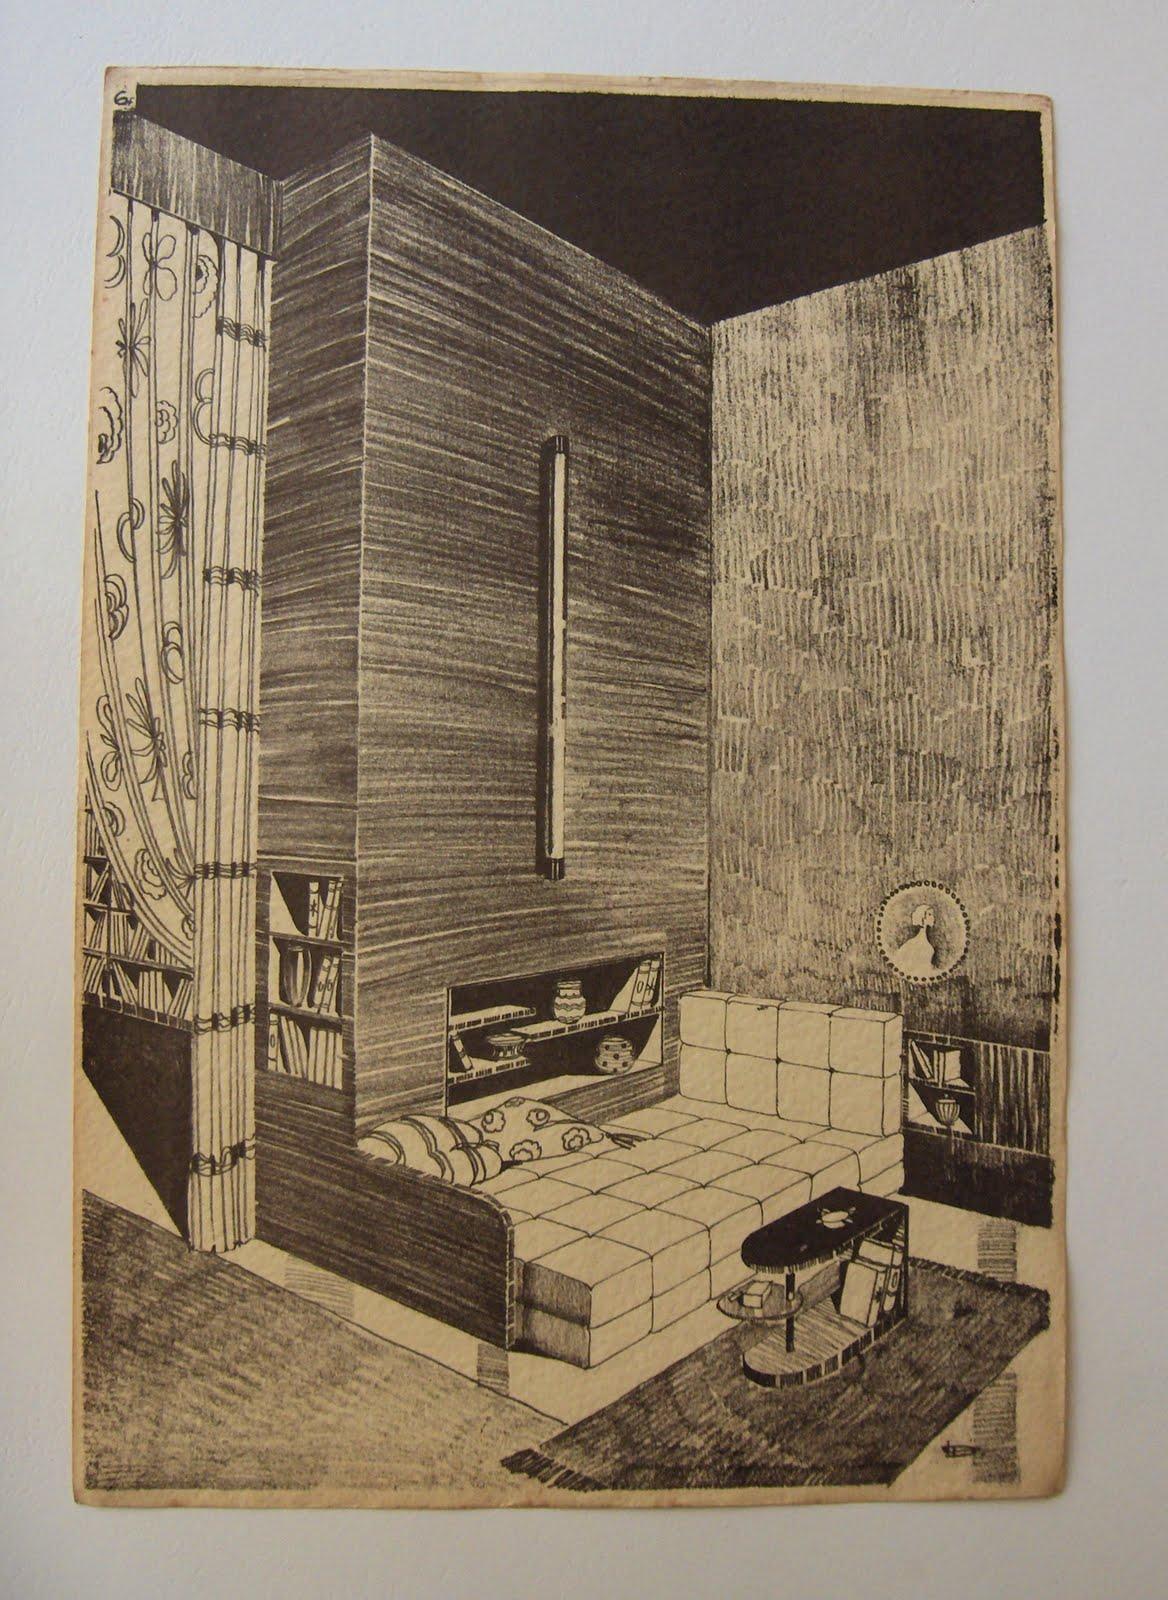 66sputnik retro corners. Black Bedroom Furniture Sets. Home Design Ideas